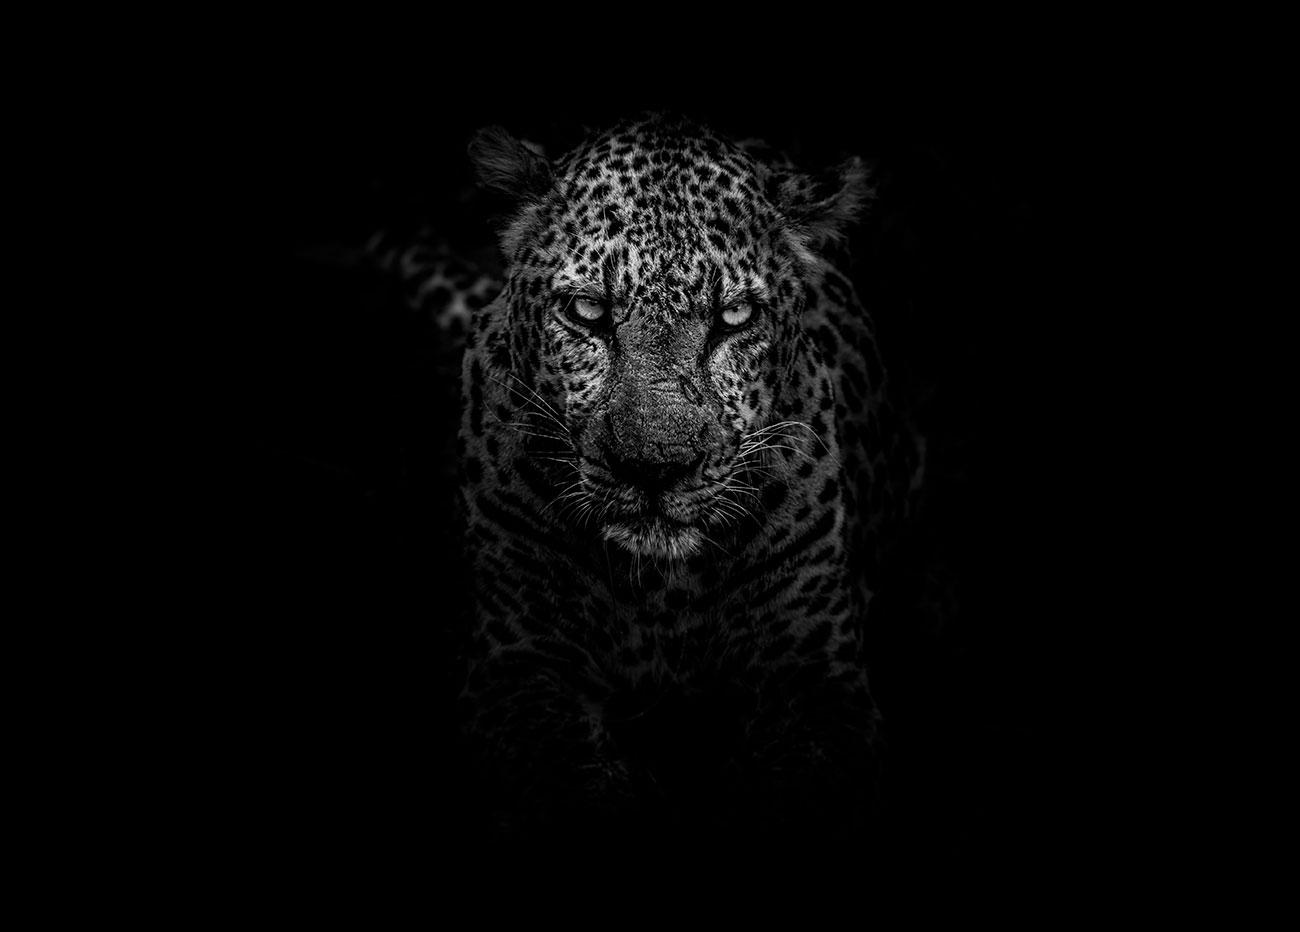 jaguar-car-poem